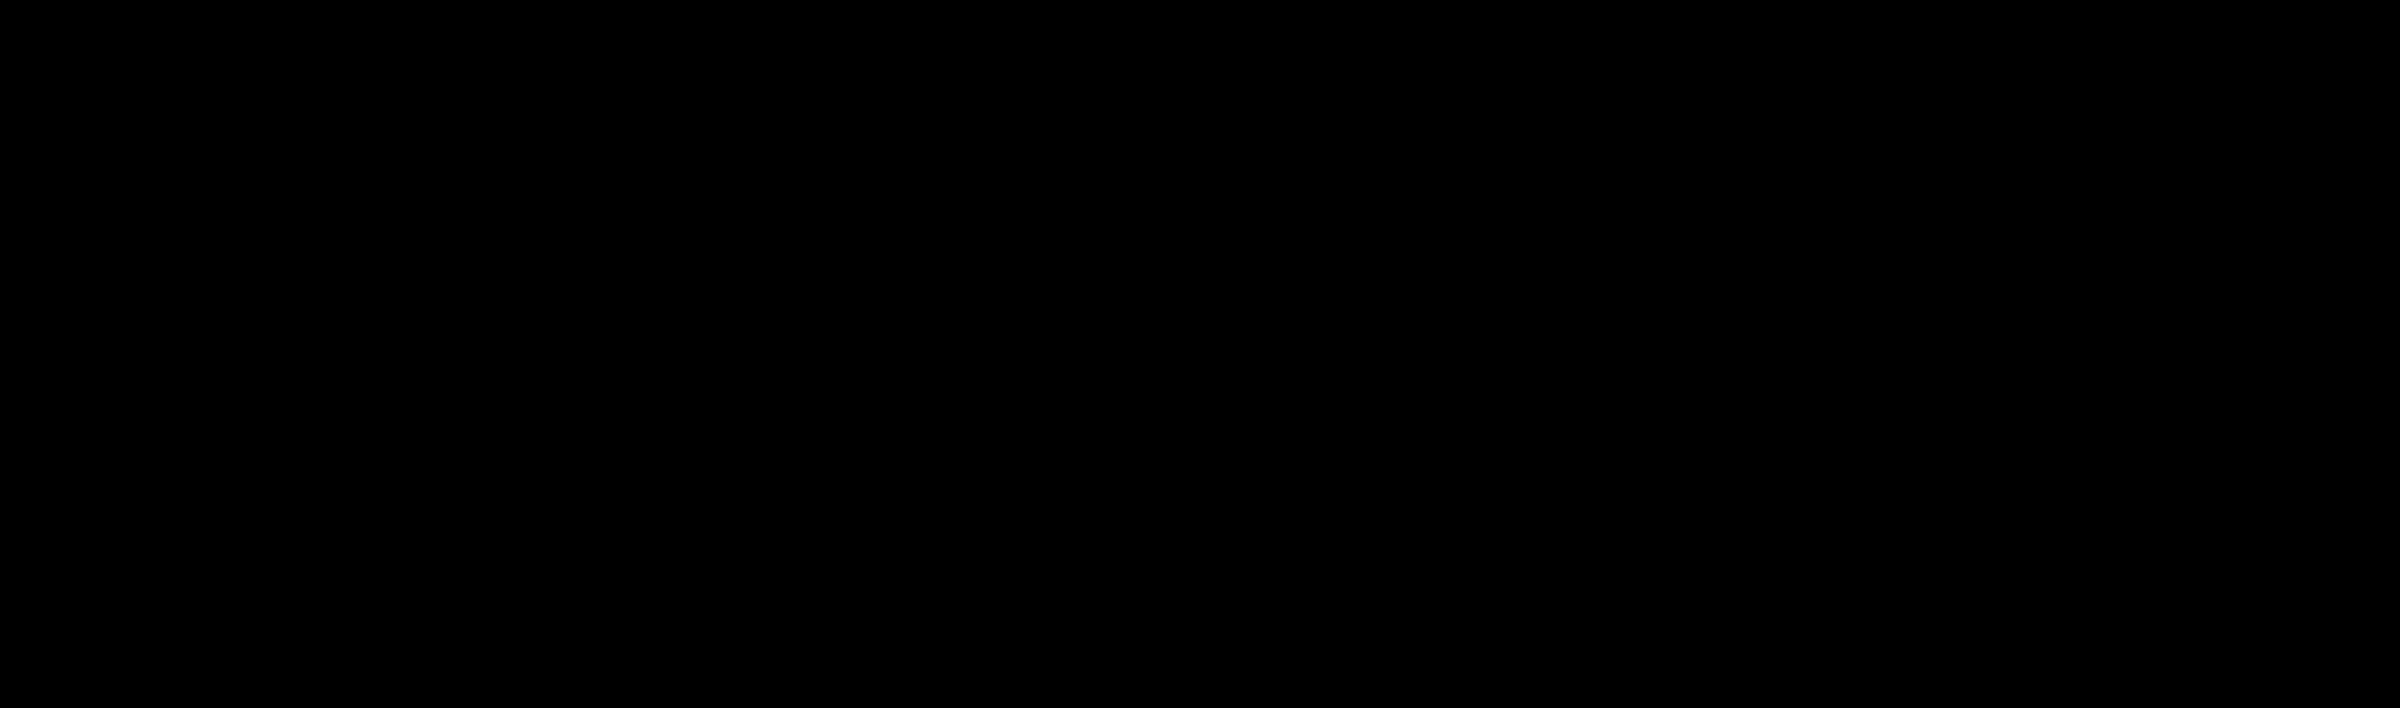 Xbox Logo Png Transparent Svg Vector Freebie Supply